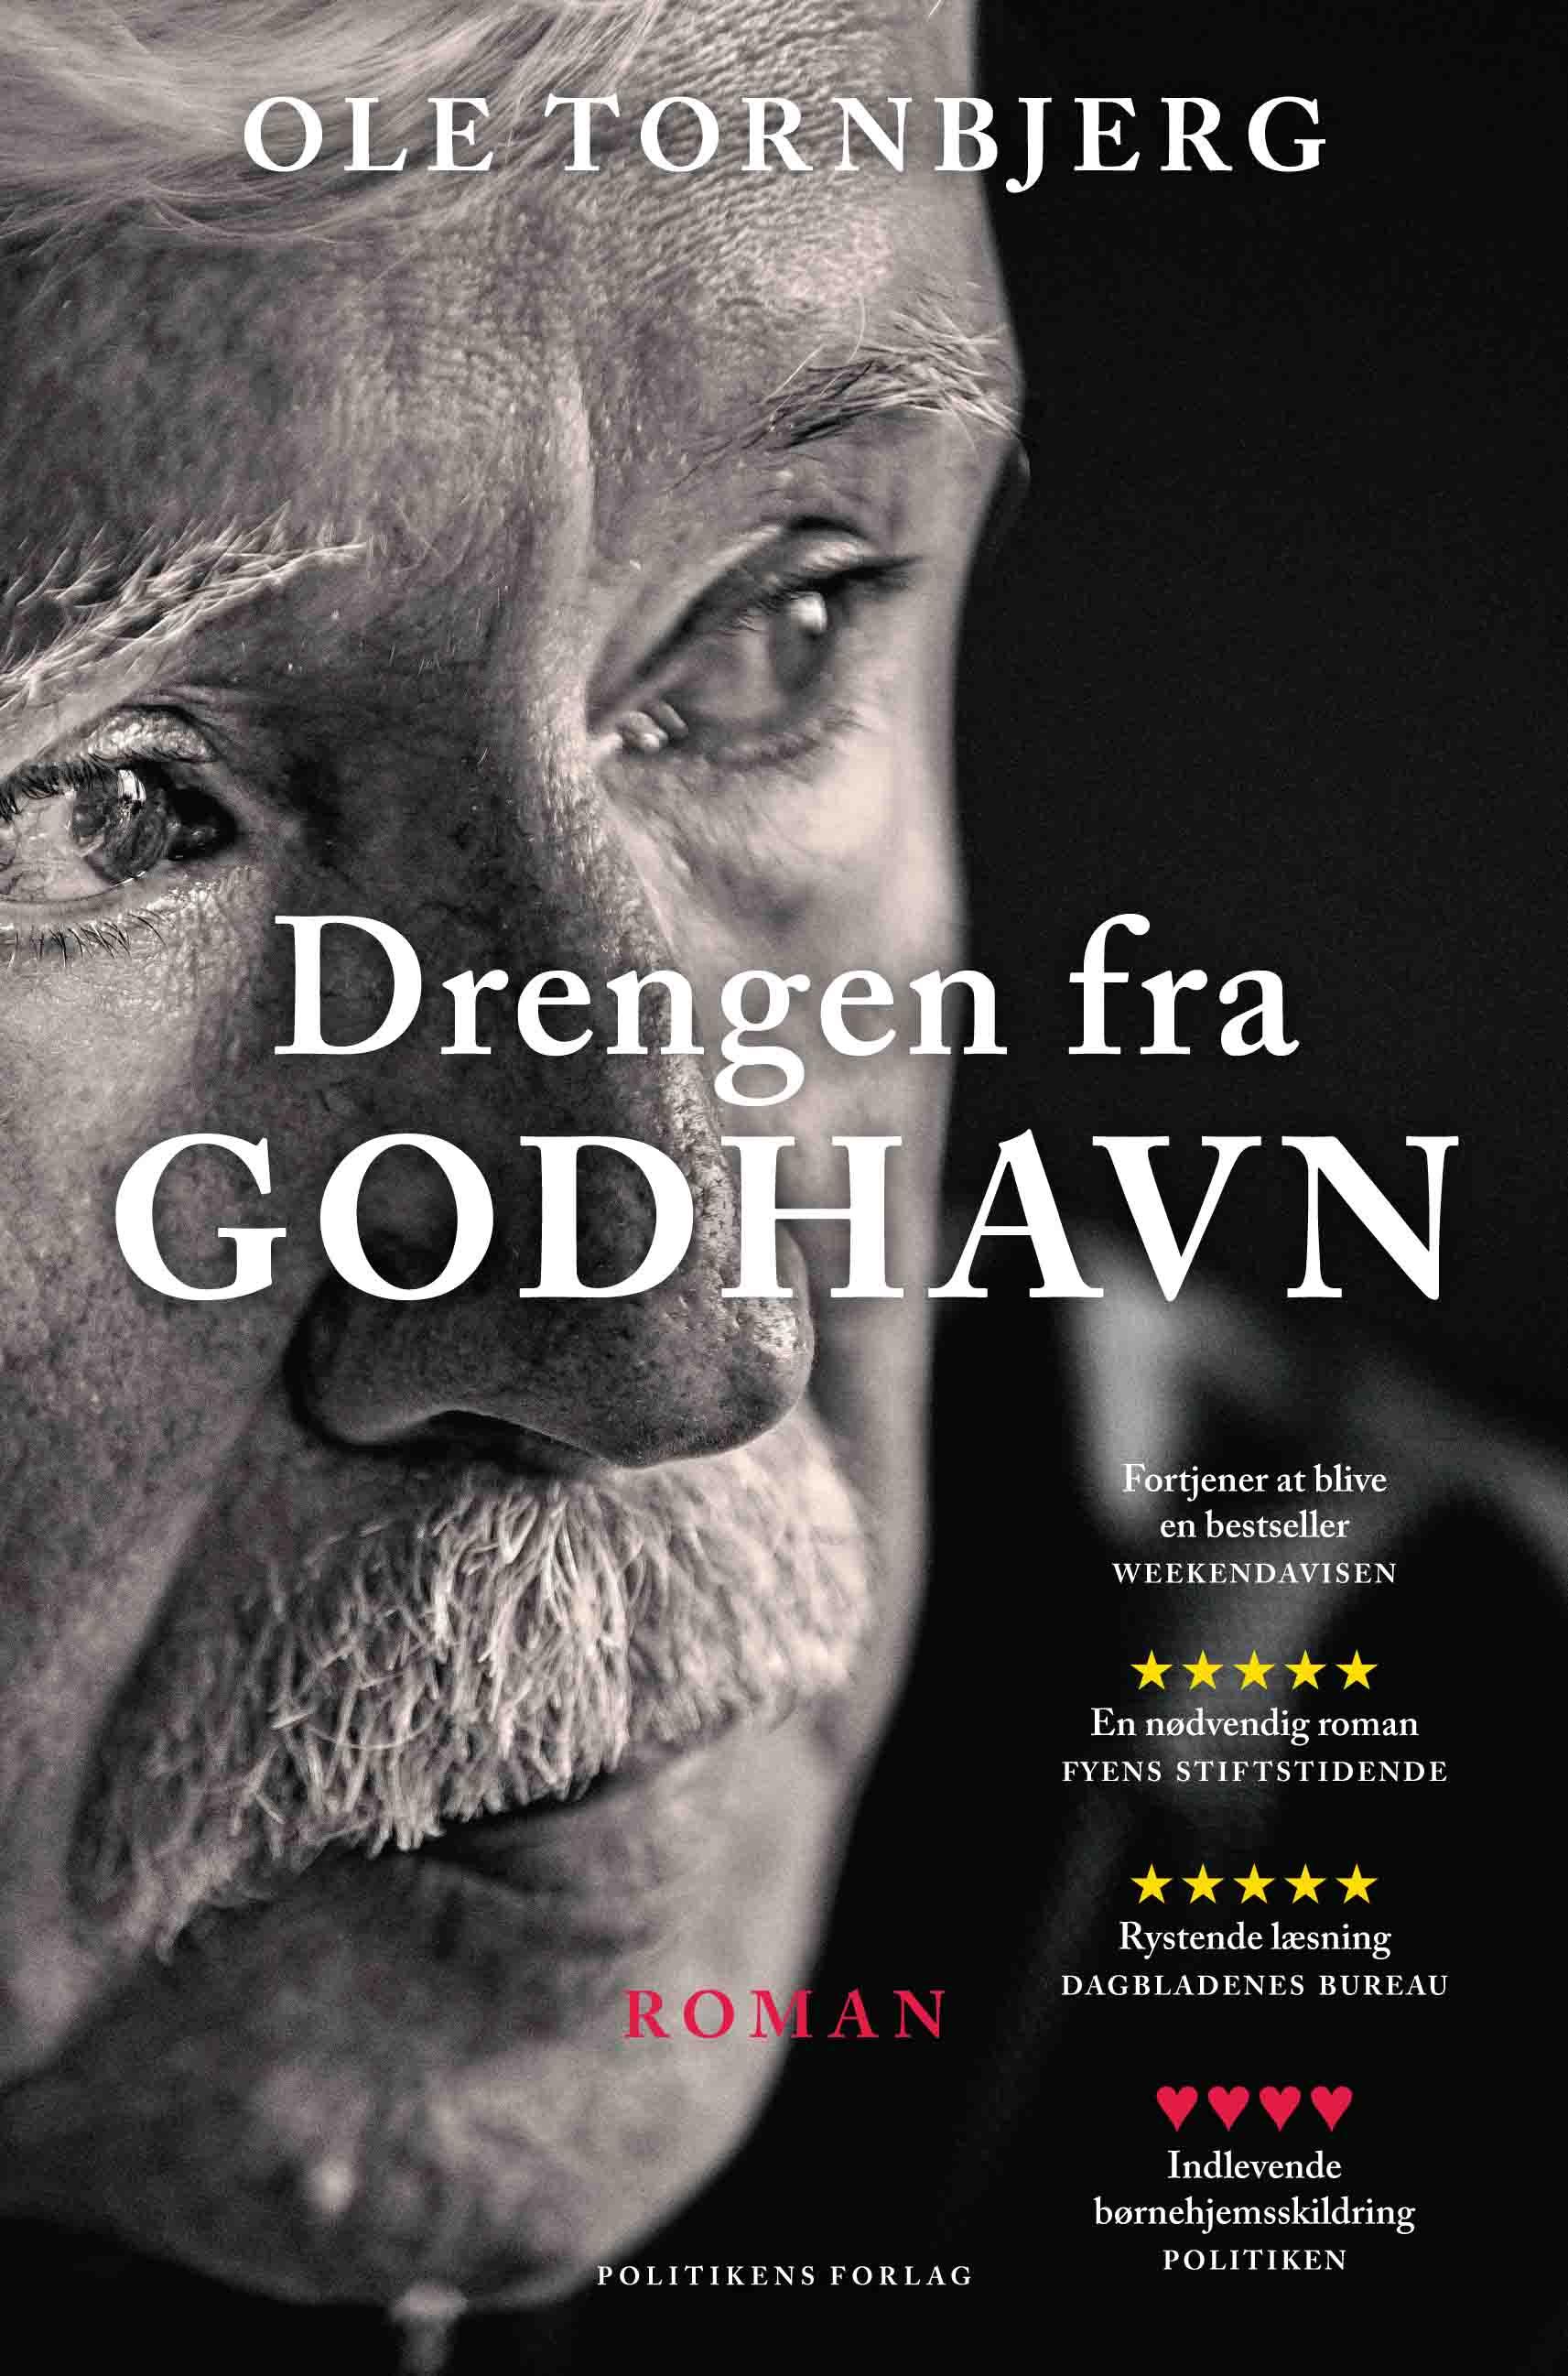 Drengen fra Godhavn - Ole Tornbjerg - Bøger - Politikens Forlag - 9788740059823 - October 24, 2019